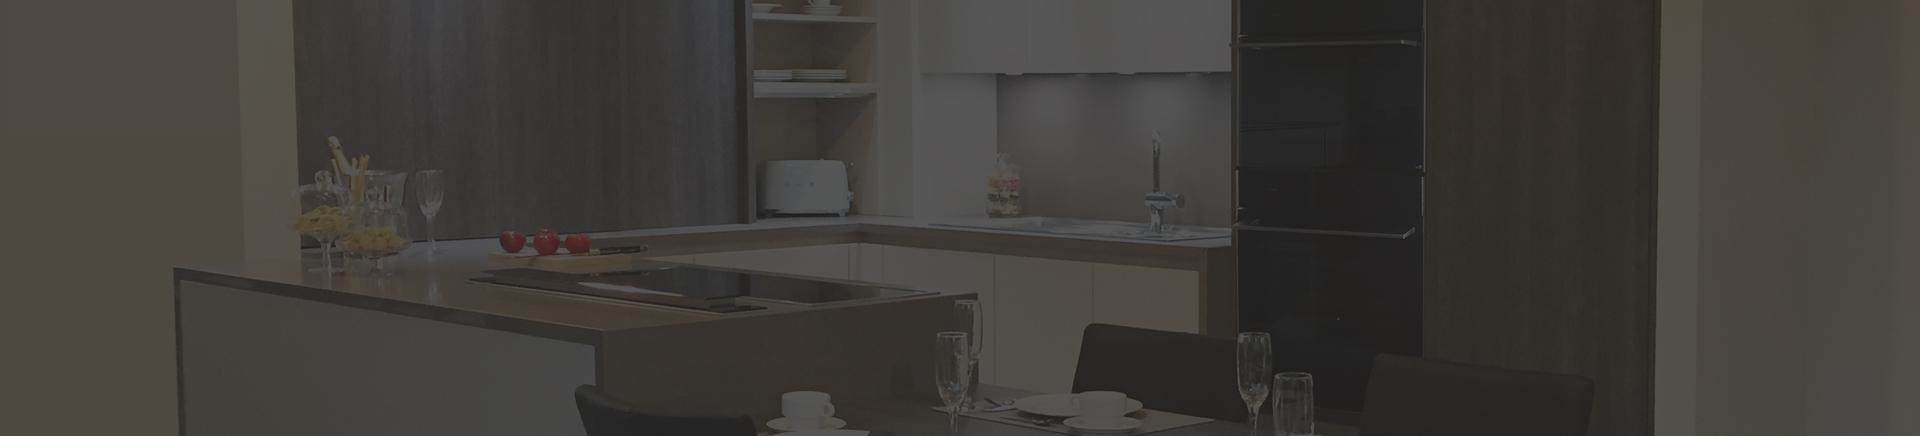 Keukencomfort - VDH Keukens Zottegem